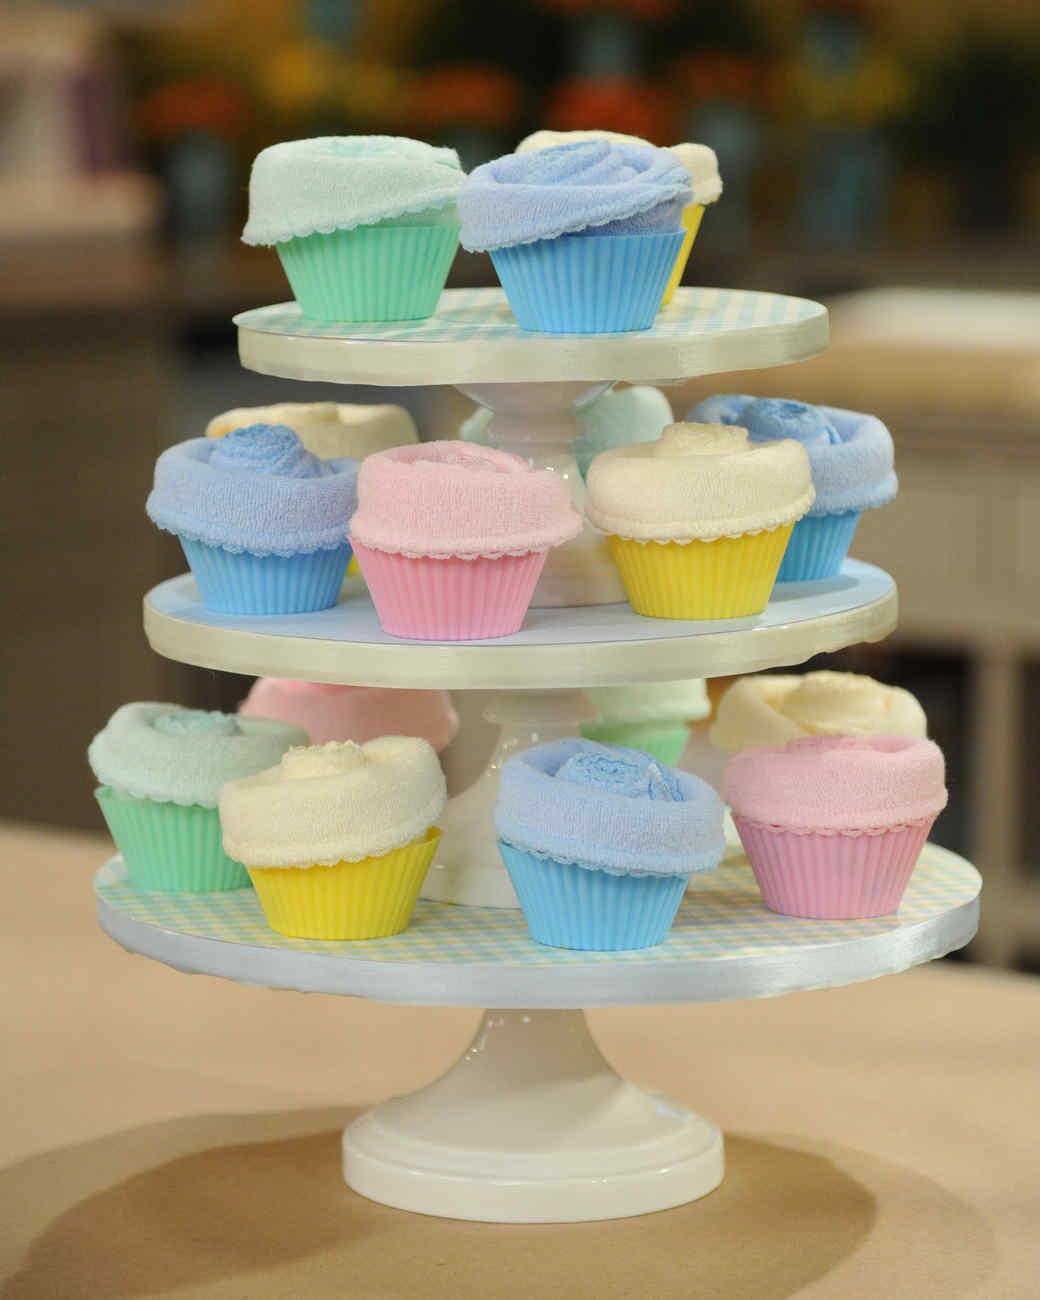 bib-cupcakes-mslb7127.jpg